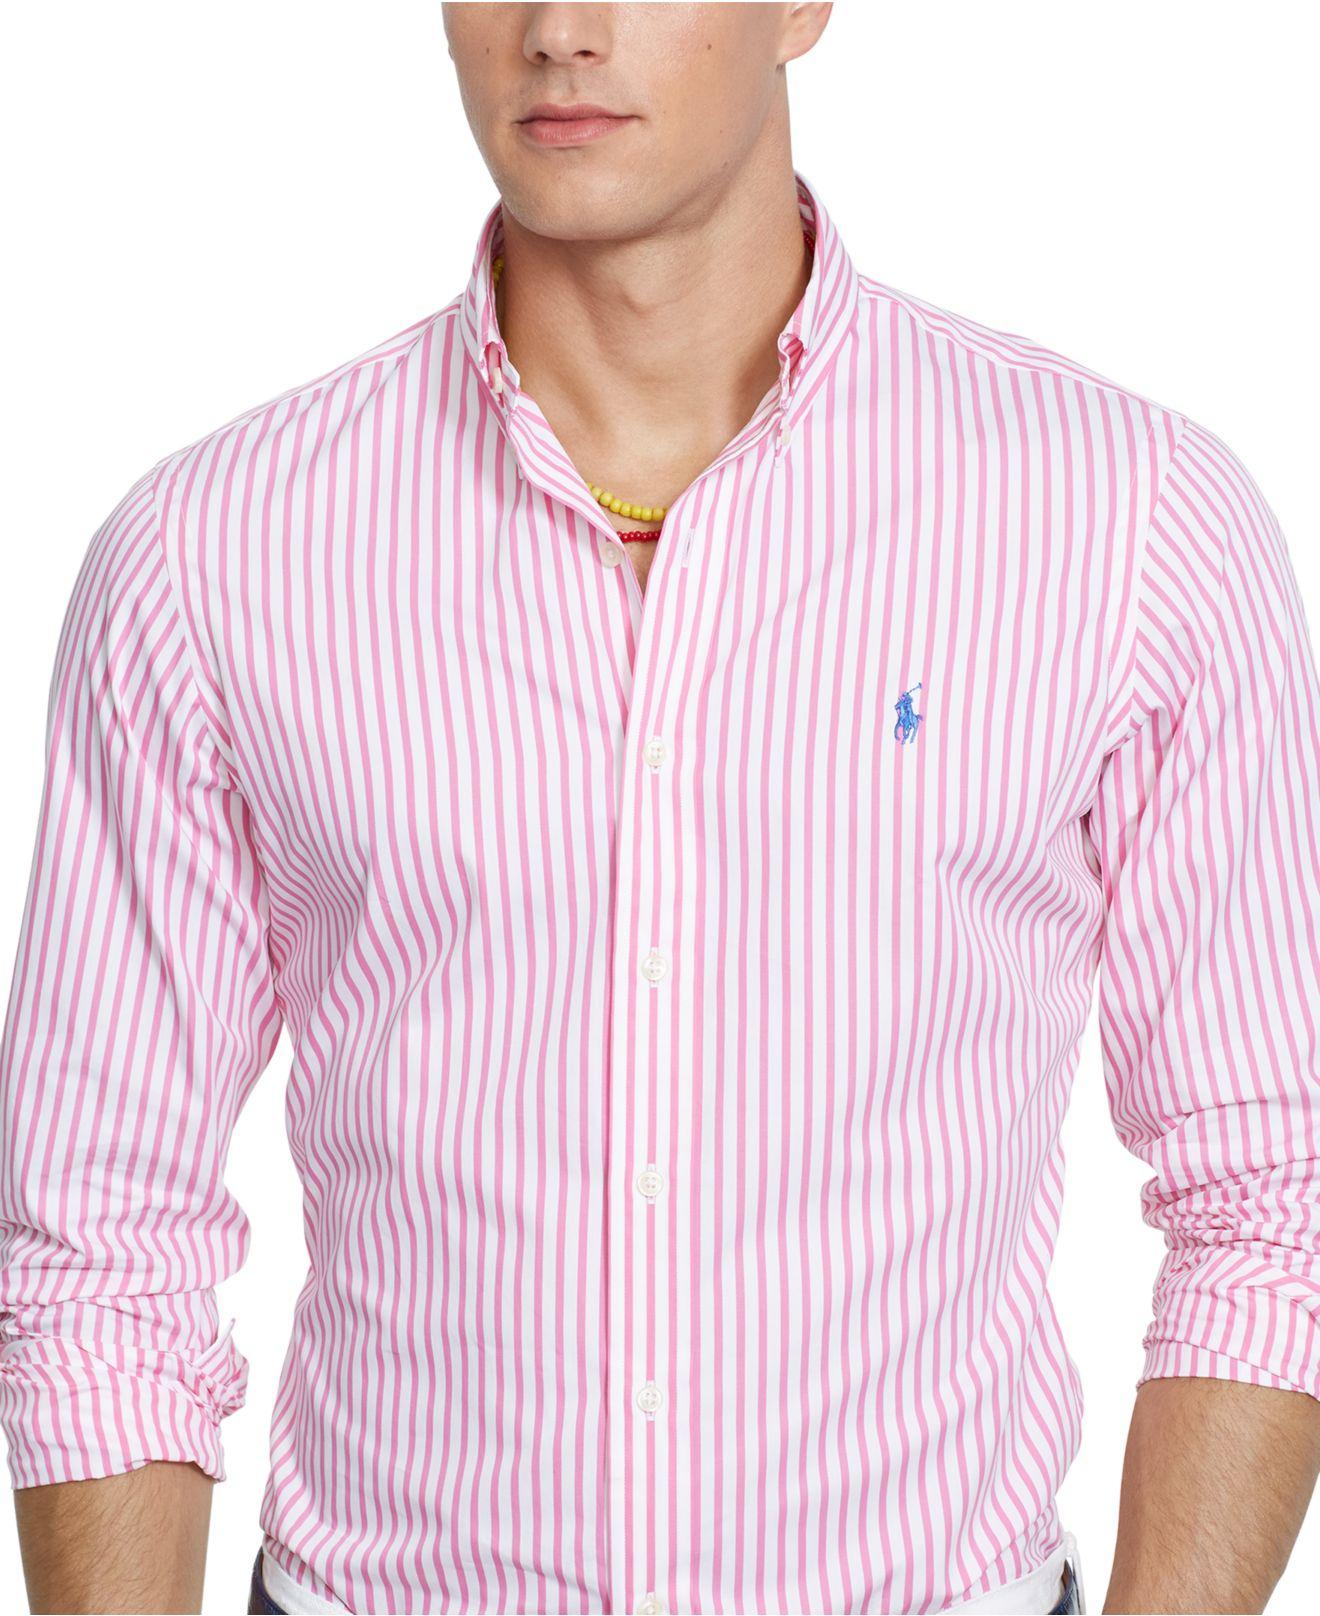 0ff10778e purchase lyst polo ralph lauren mens long sleeve striped poplin shirt in  0ed75 02bcb